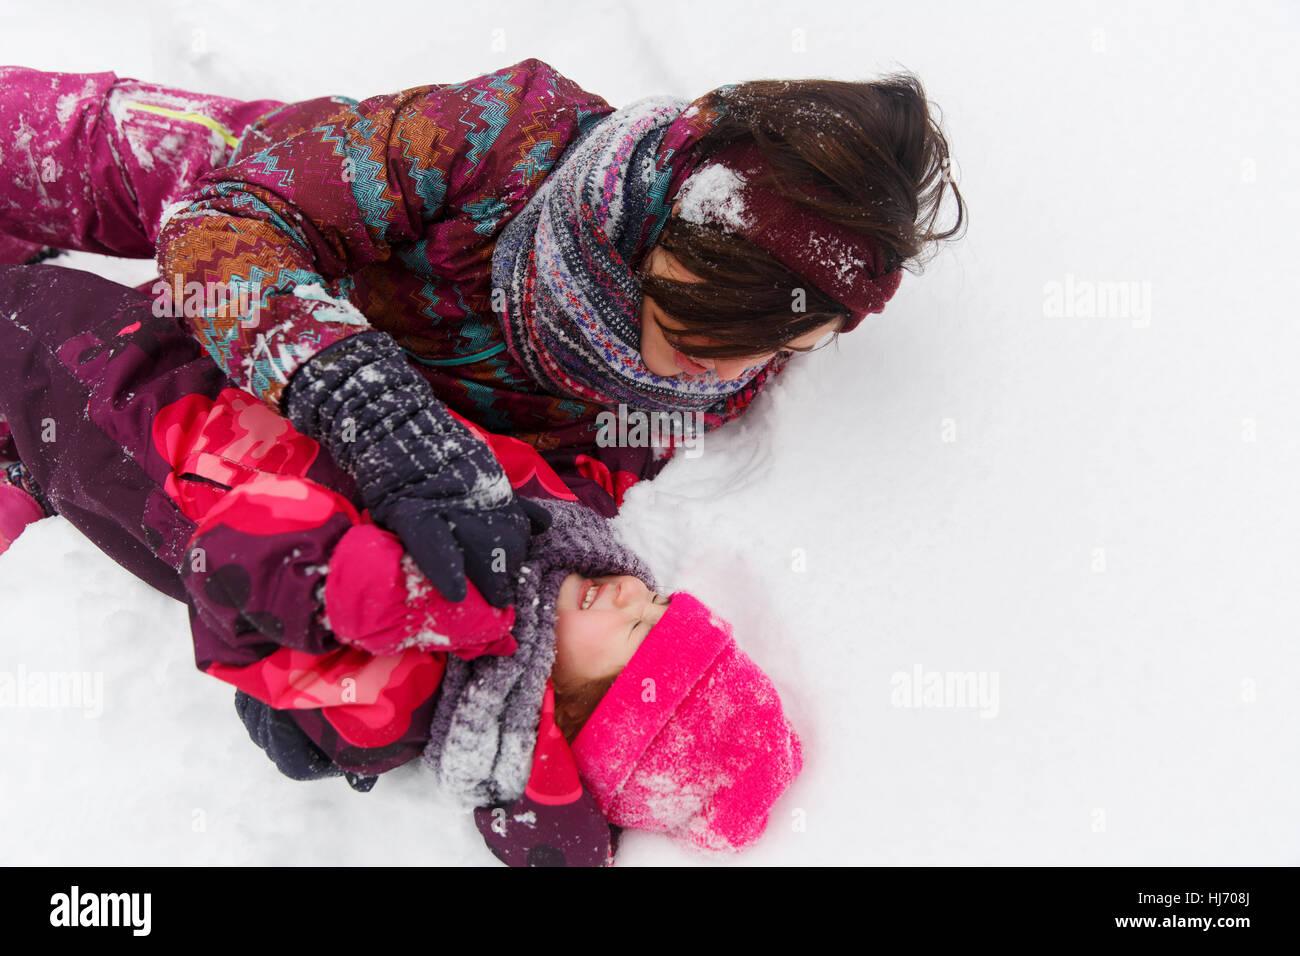 Brunette ,daughter in snowy park - Stock Image